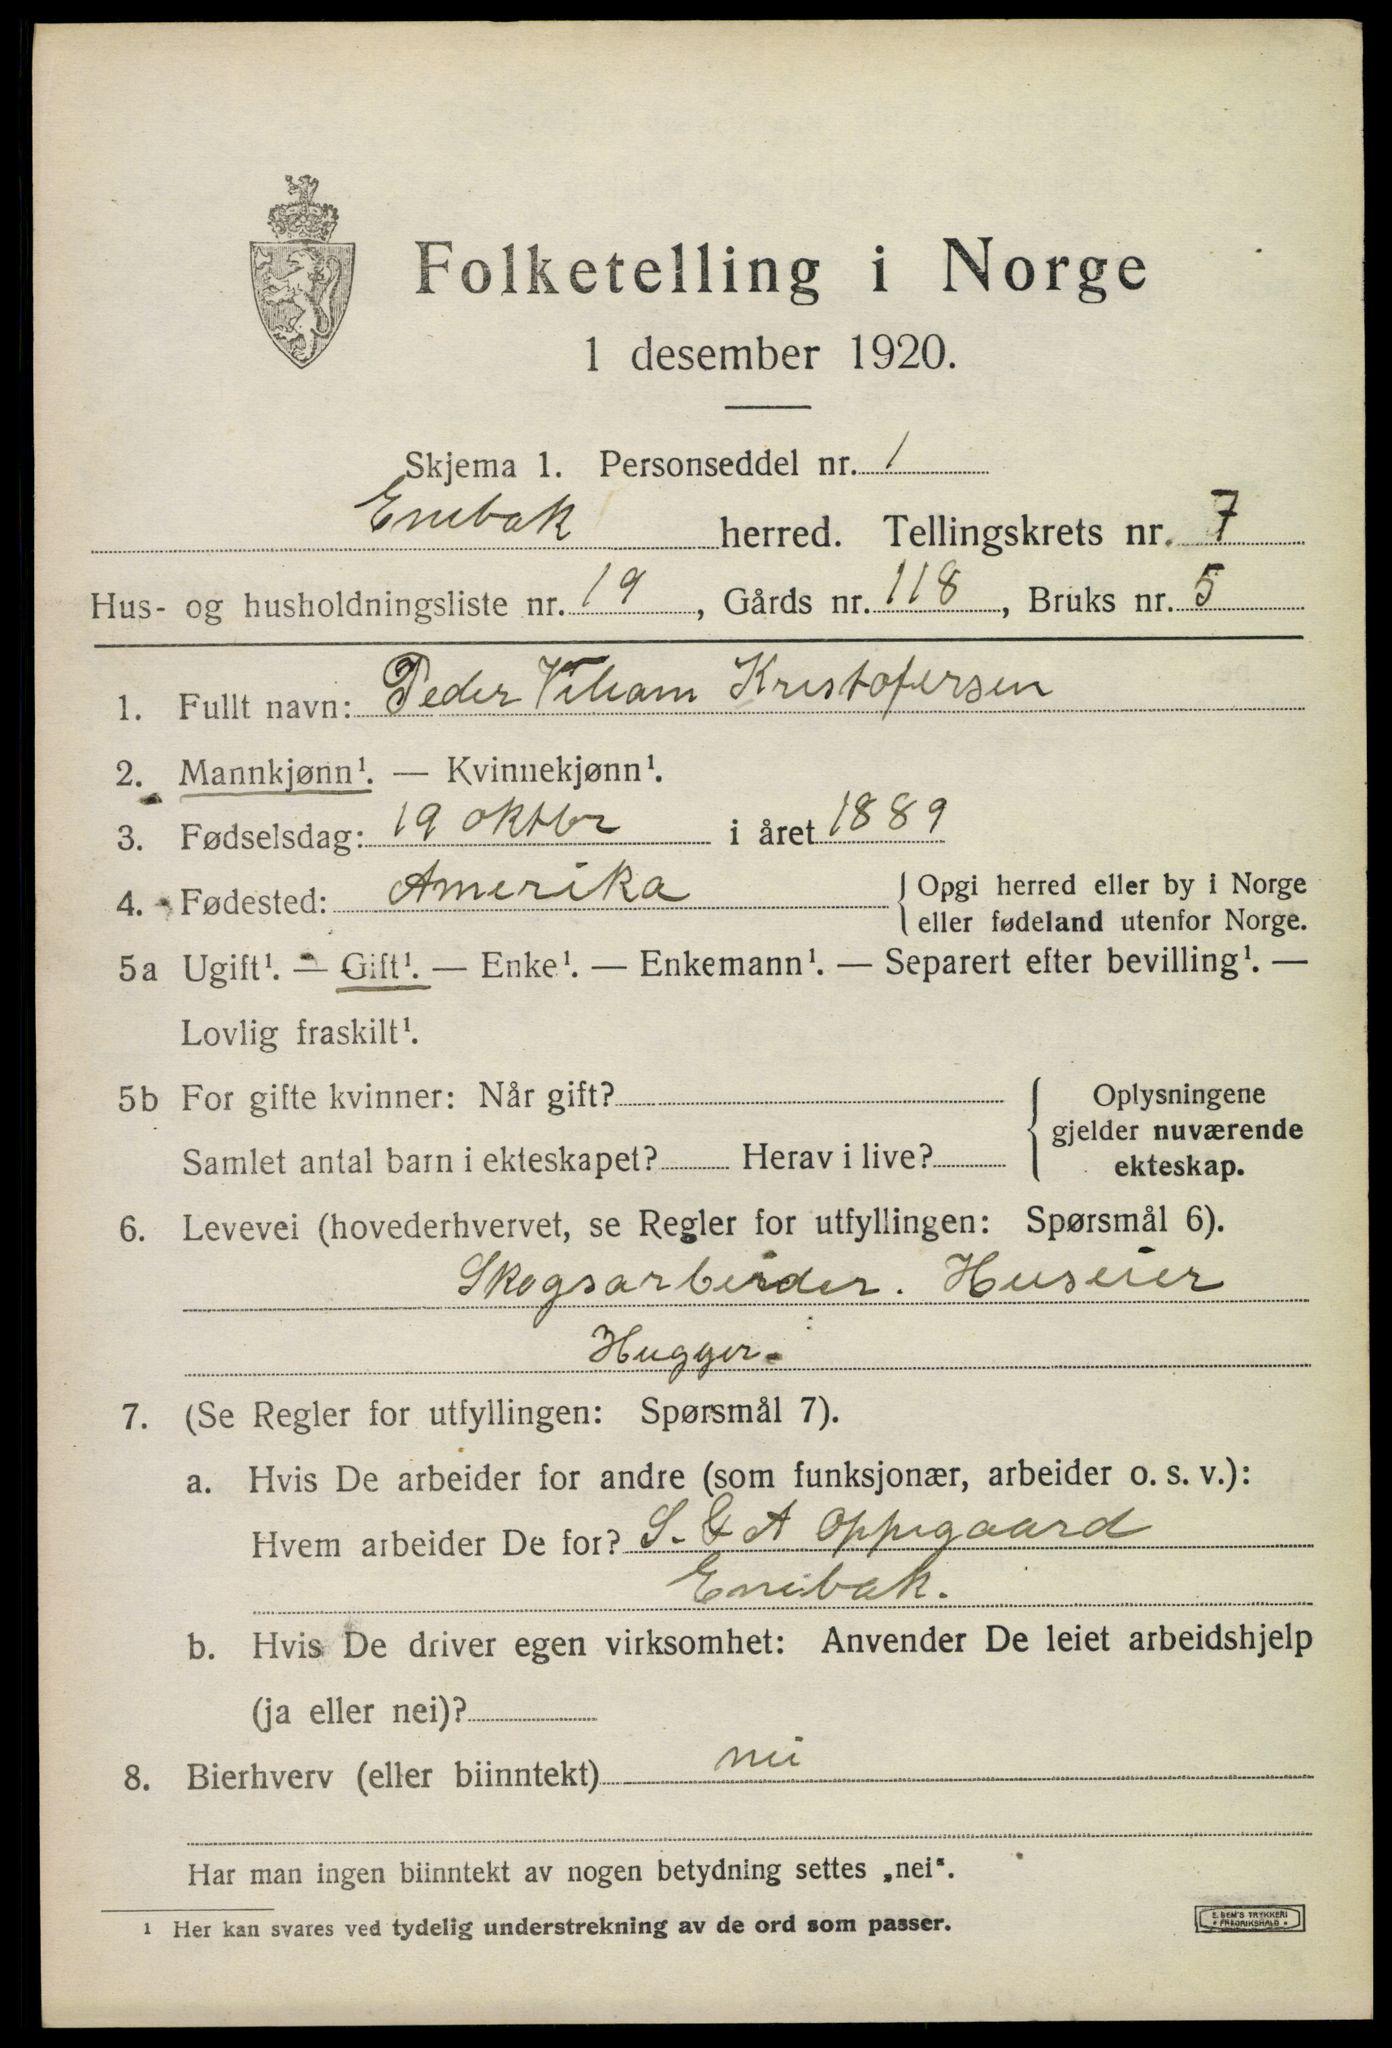 SAO, 1920 census for Enebakk, 1920, p. 6319